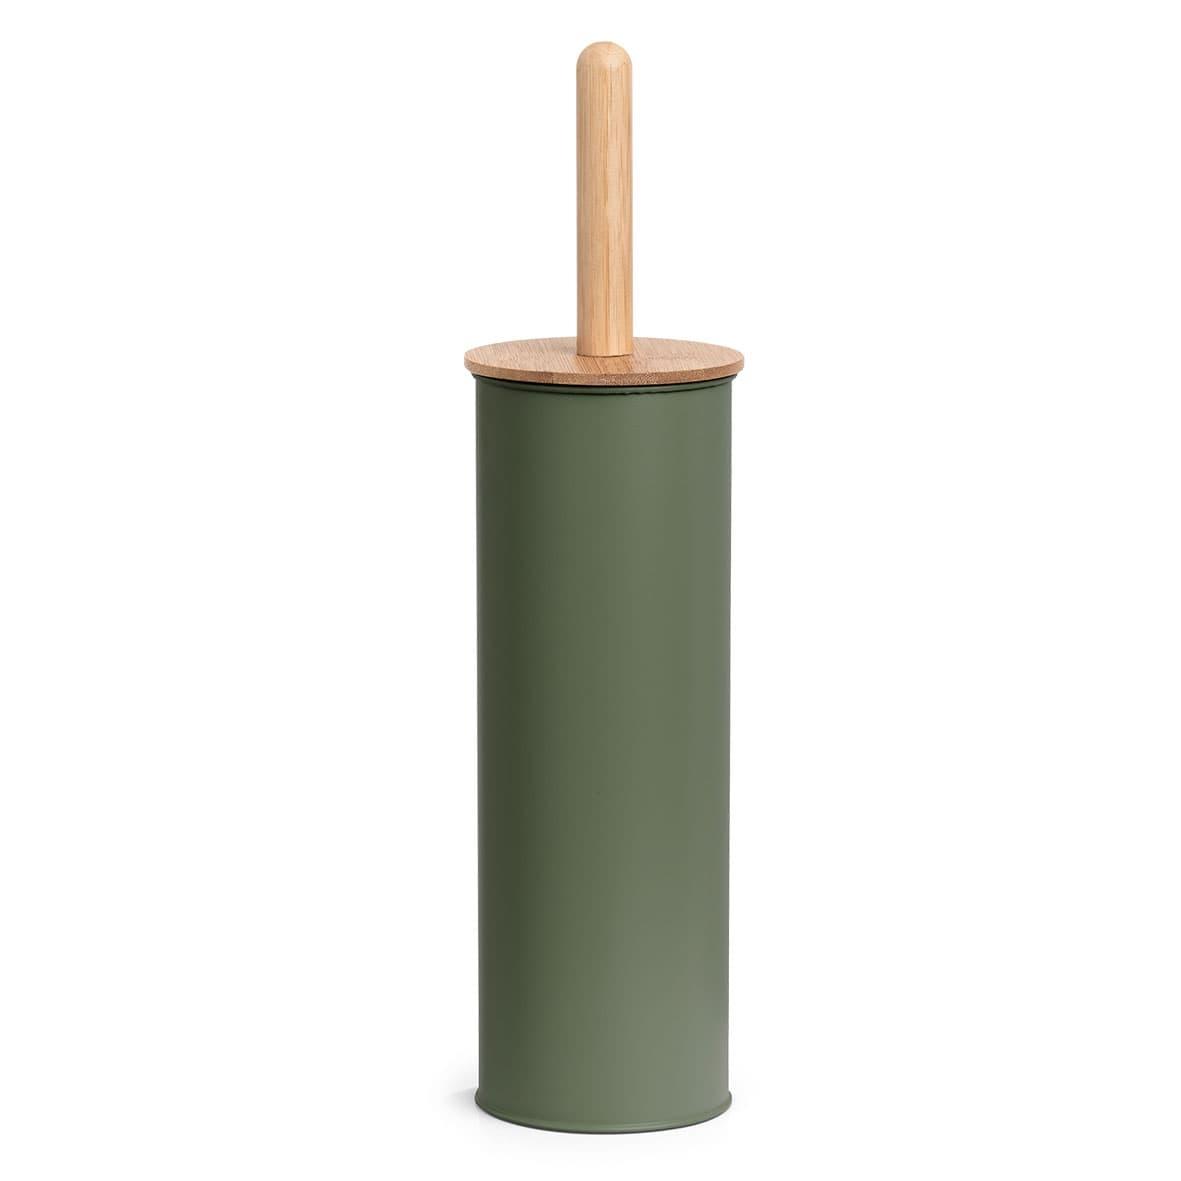 Perie de toaleta cu suport din metal, Shade III Verde Inchis, Ø10xH38,4 cm imagine